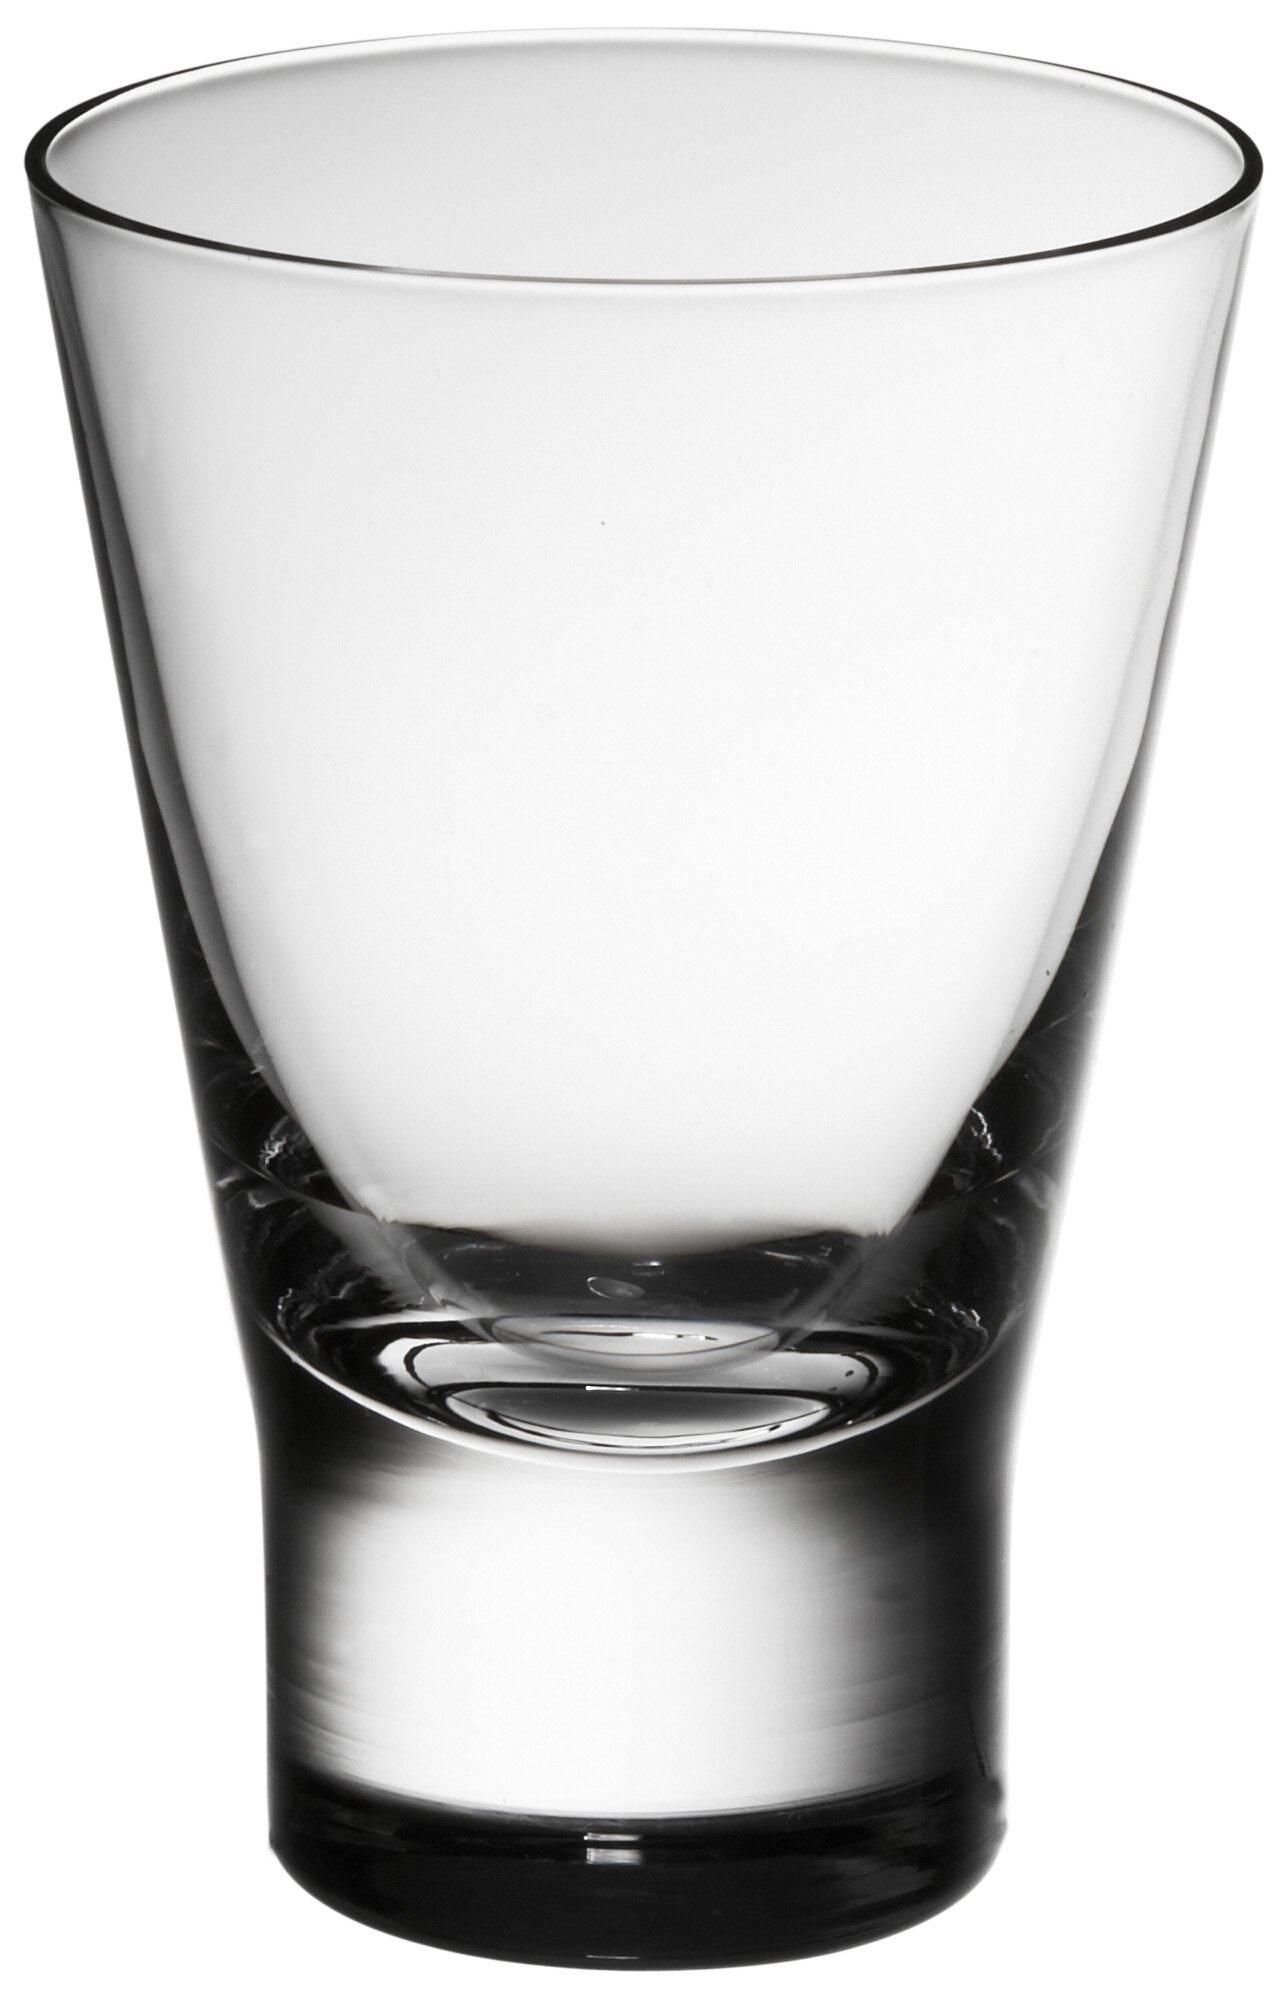 Iittala Aarne Cordial Glasses, Set of 2